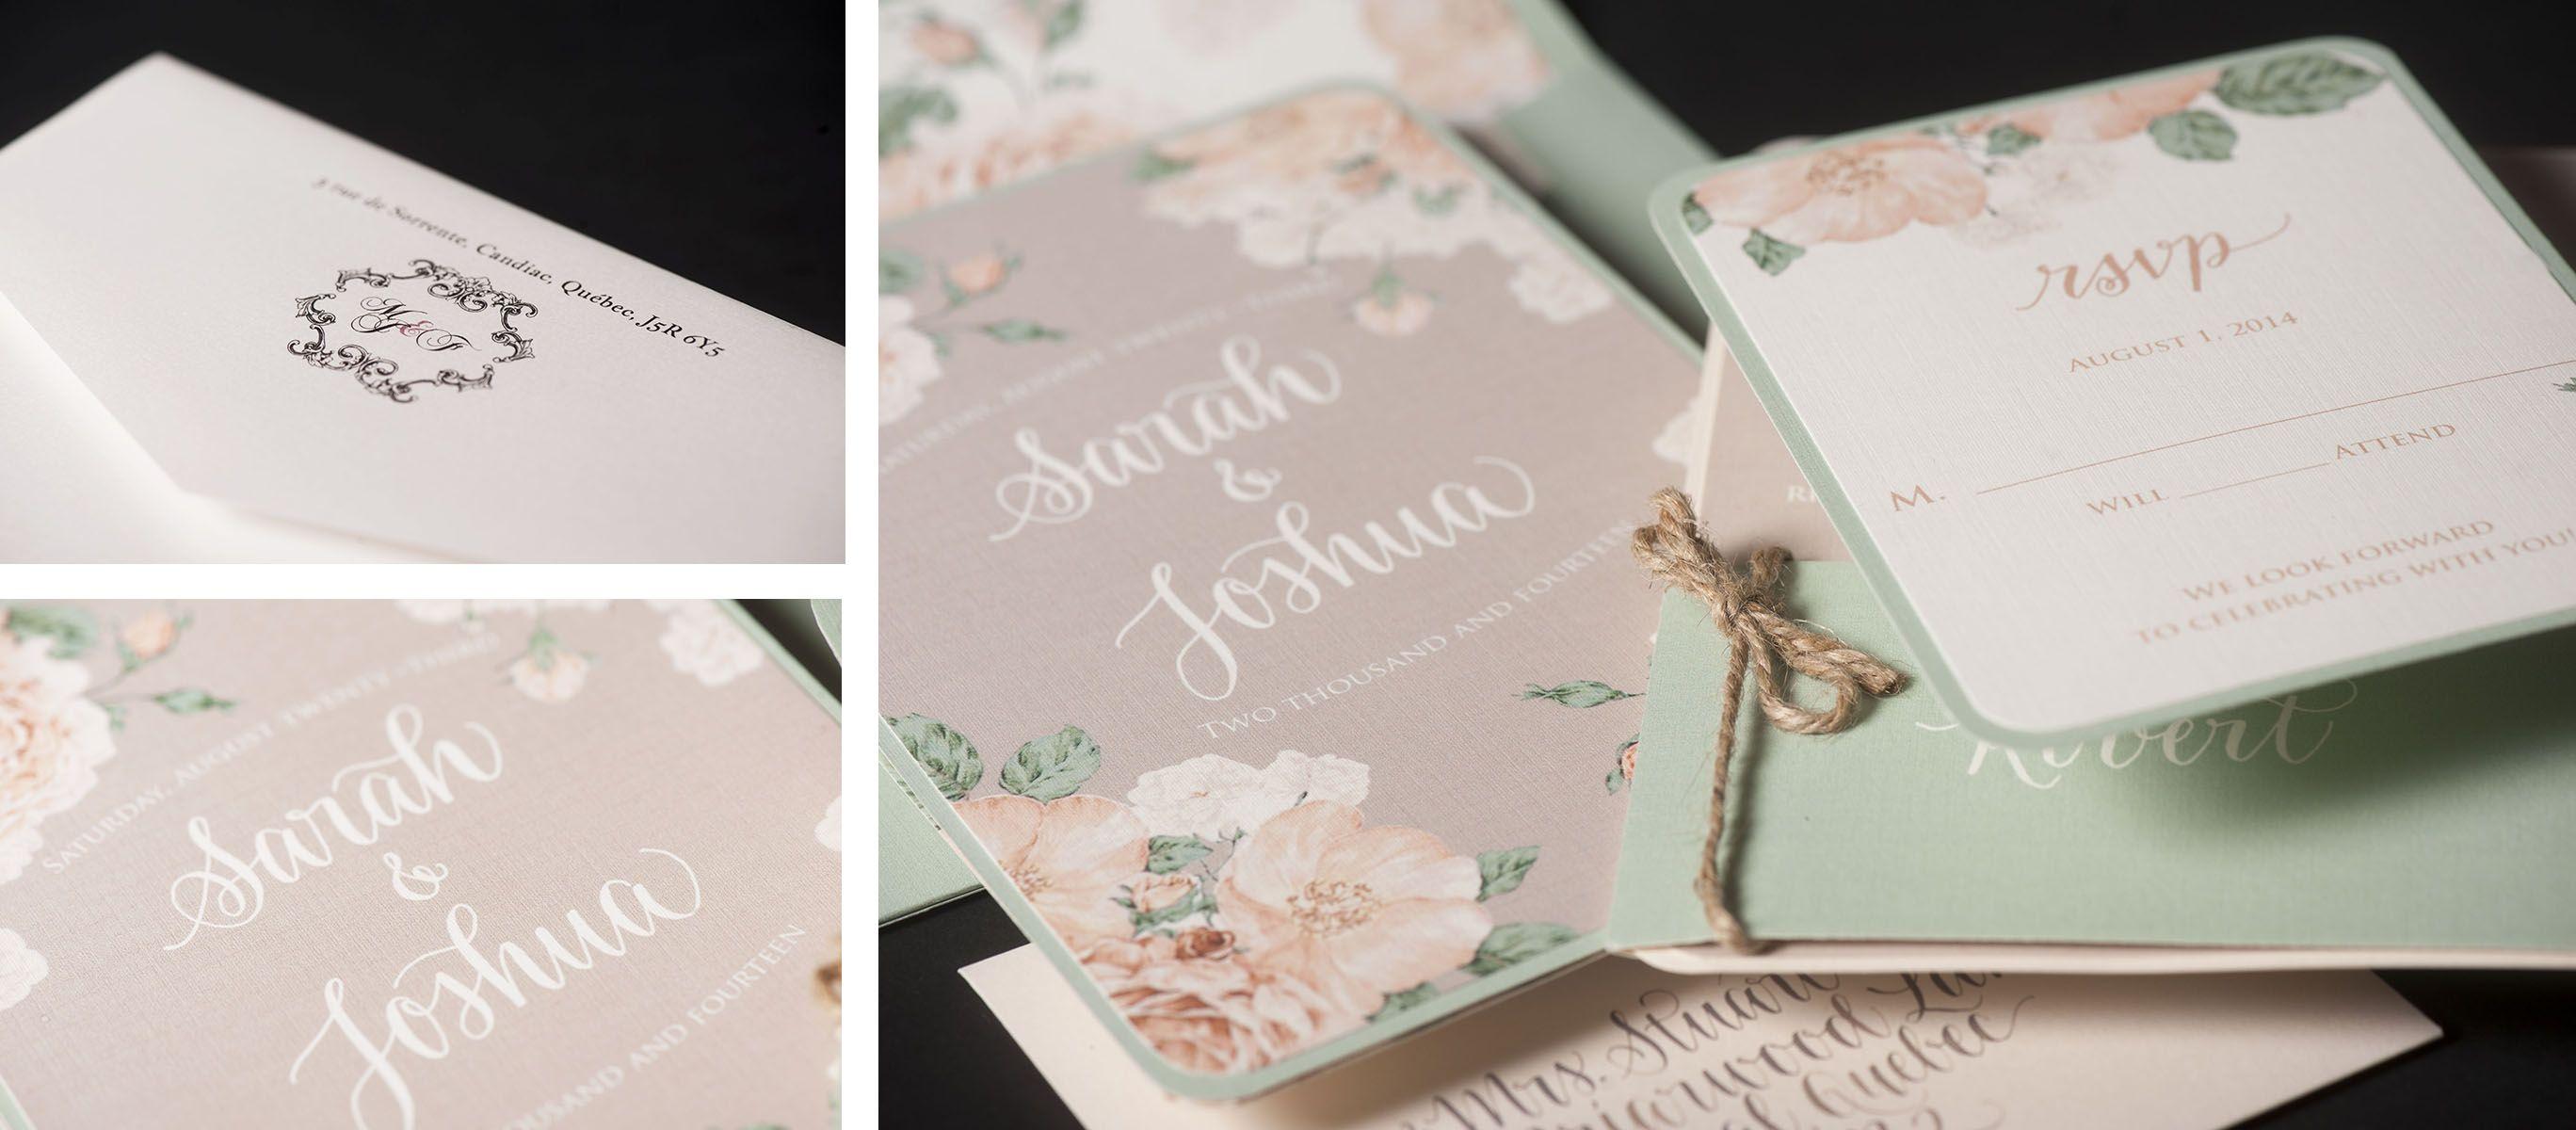 creative expressions couture;wedding invitation;invitation;wedding ...